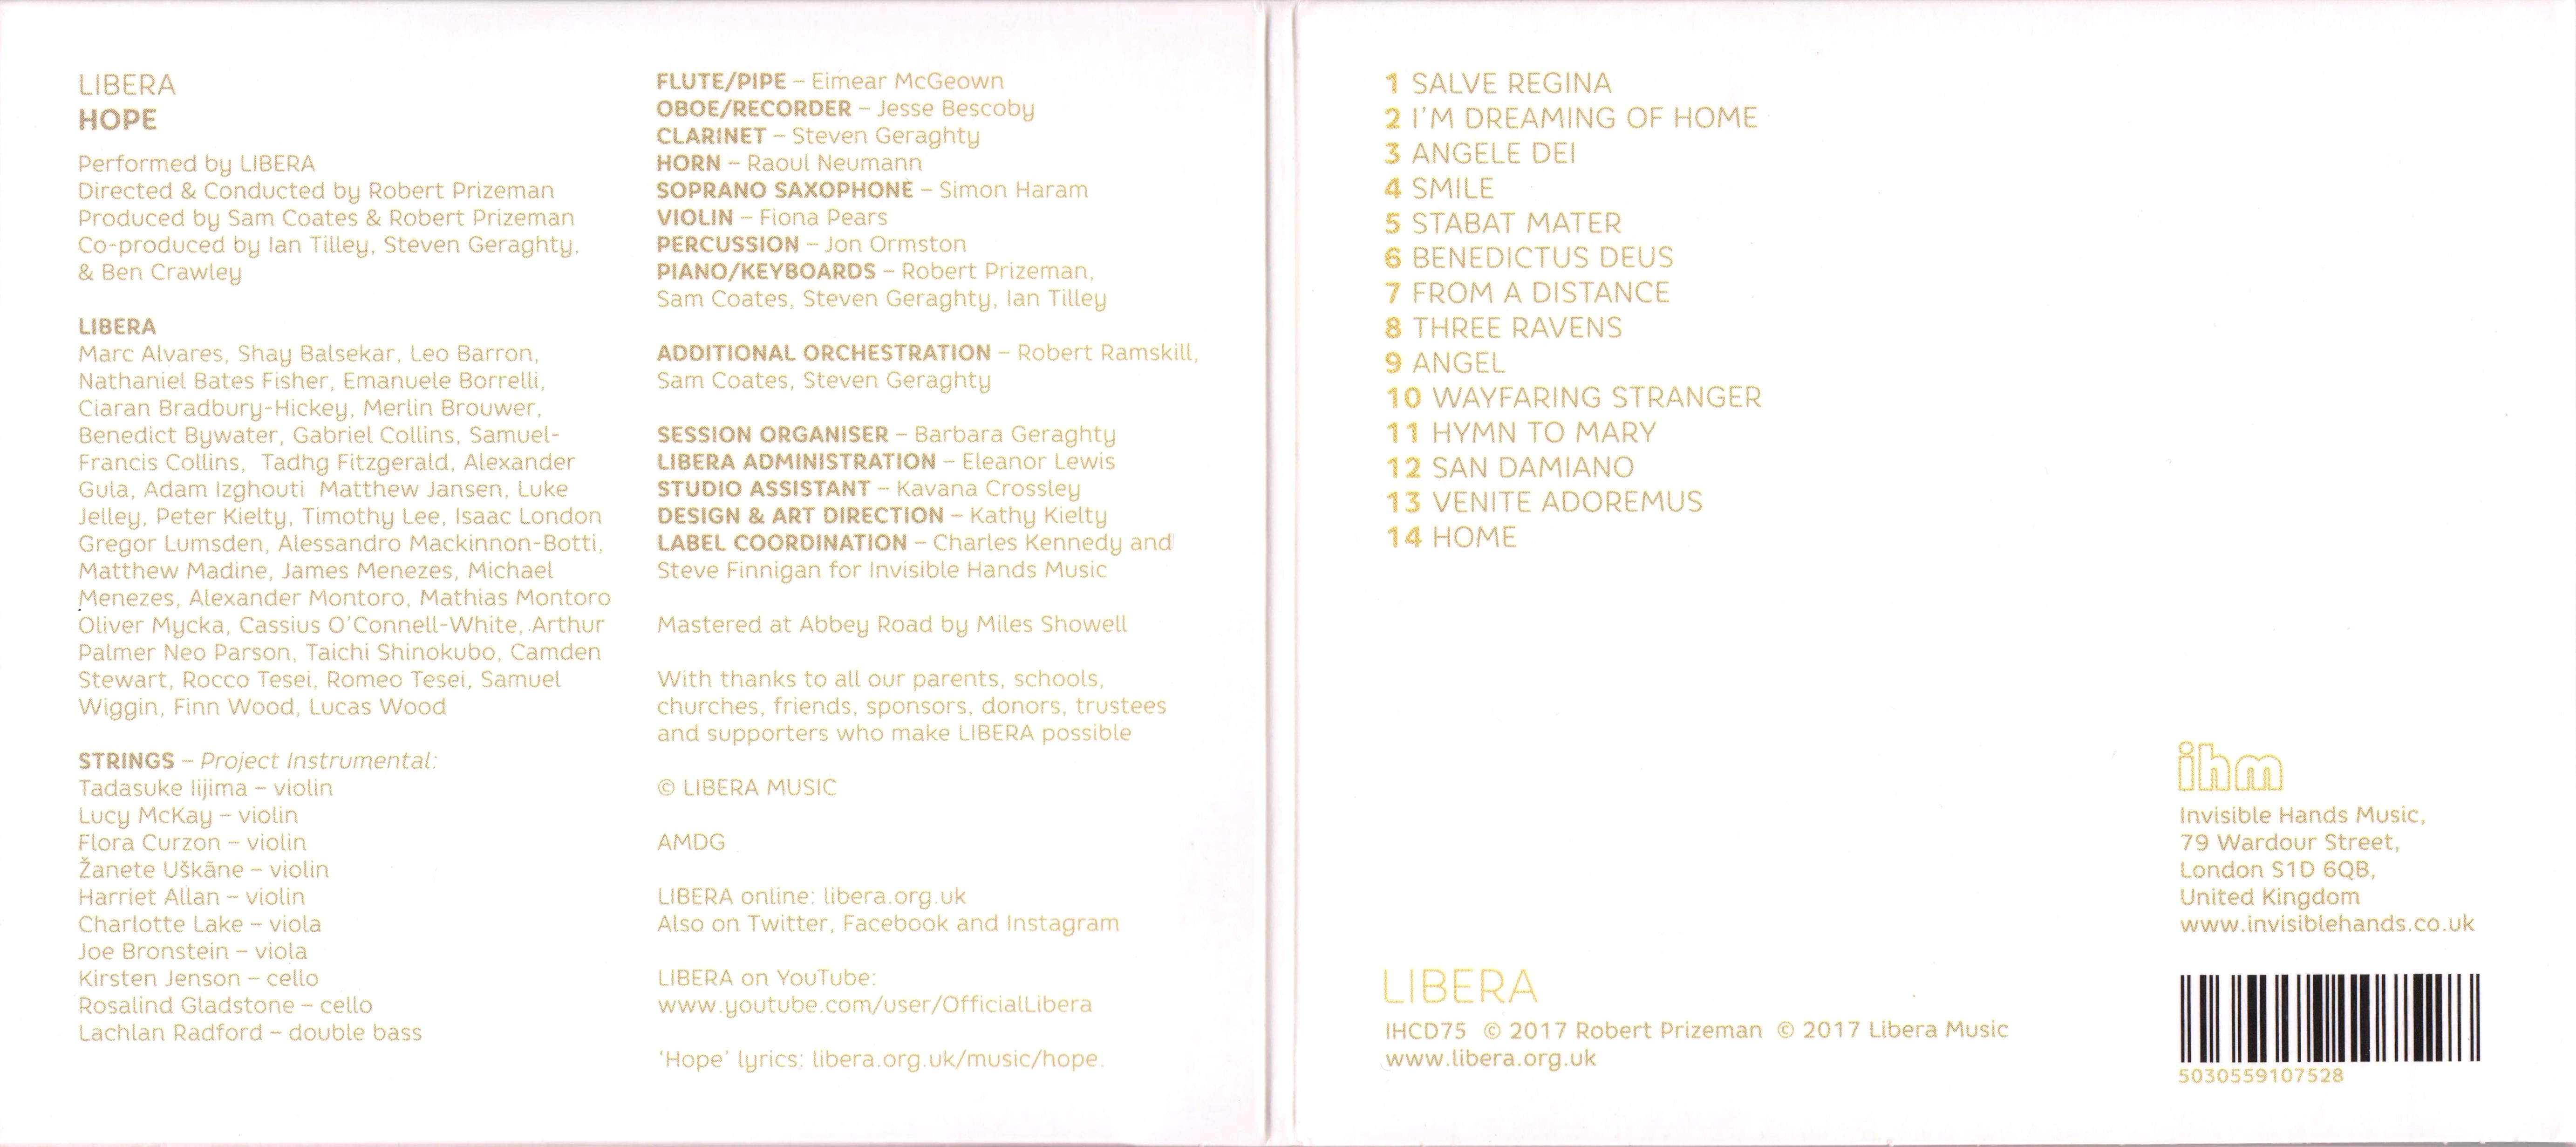 La discographie Libera - Page 2 475677Doslarge